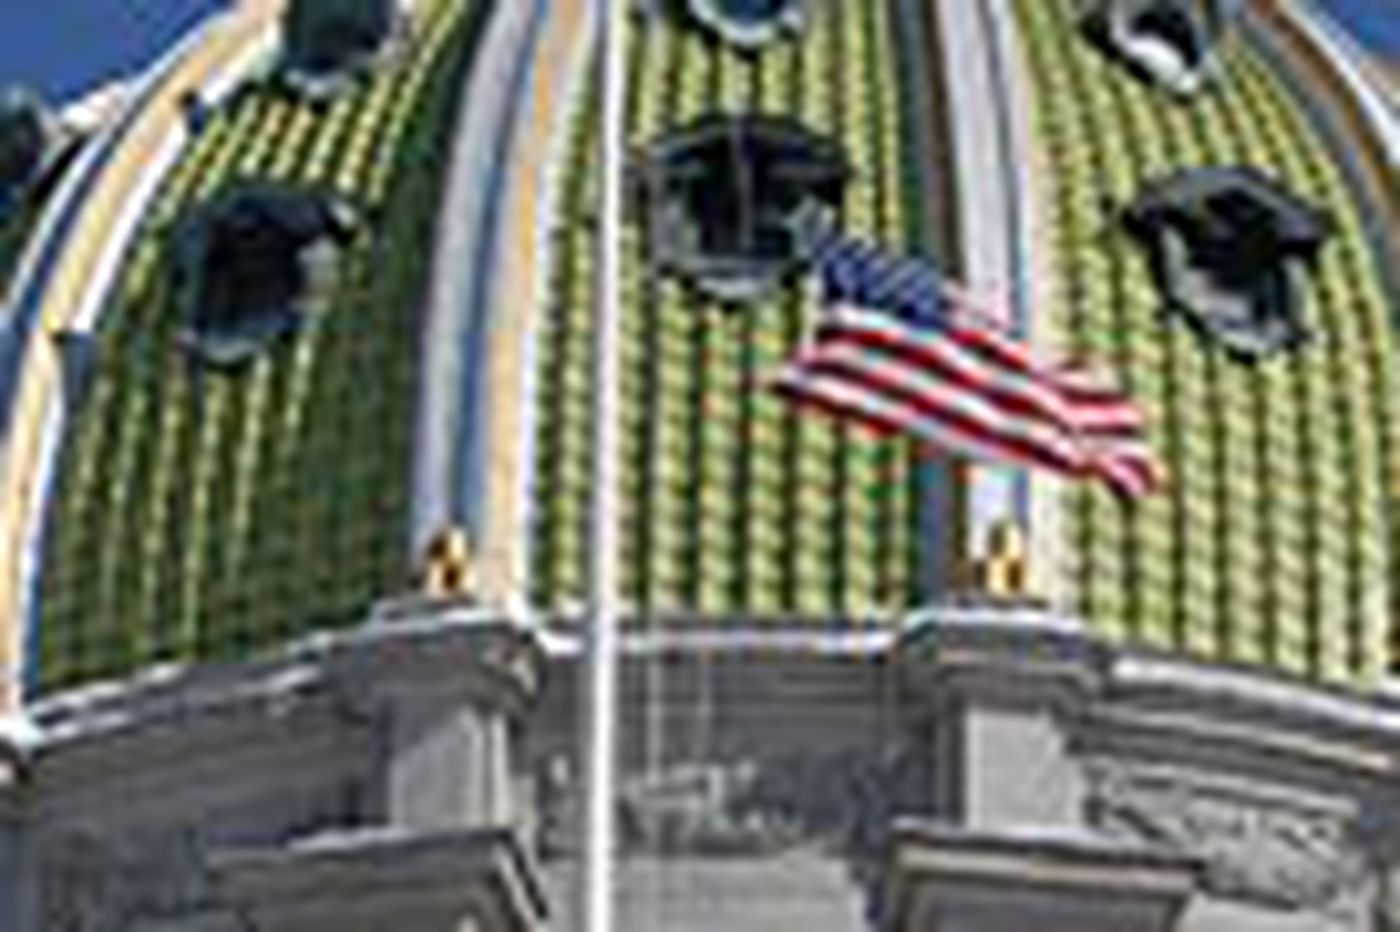 Lobbyist for solar-trade groups faces challenges pushing legislation